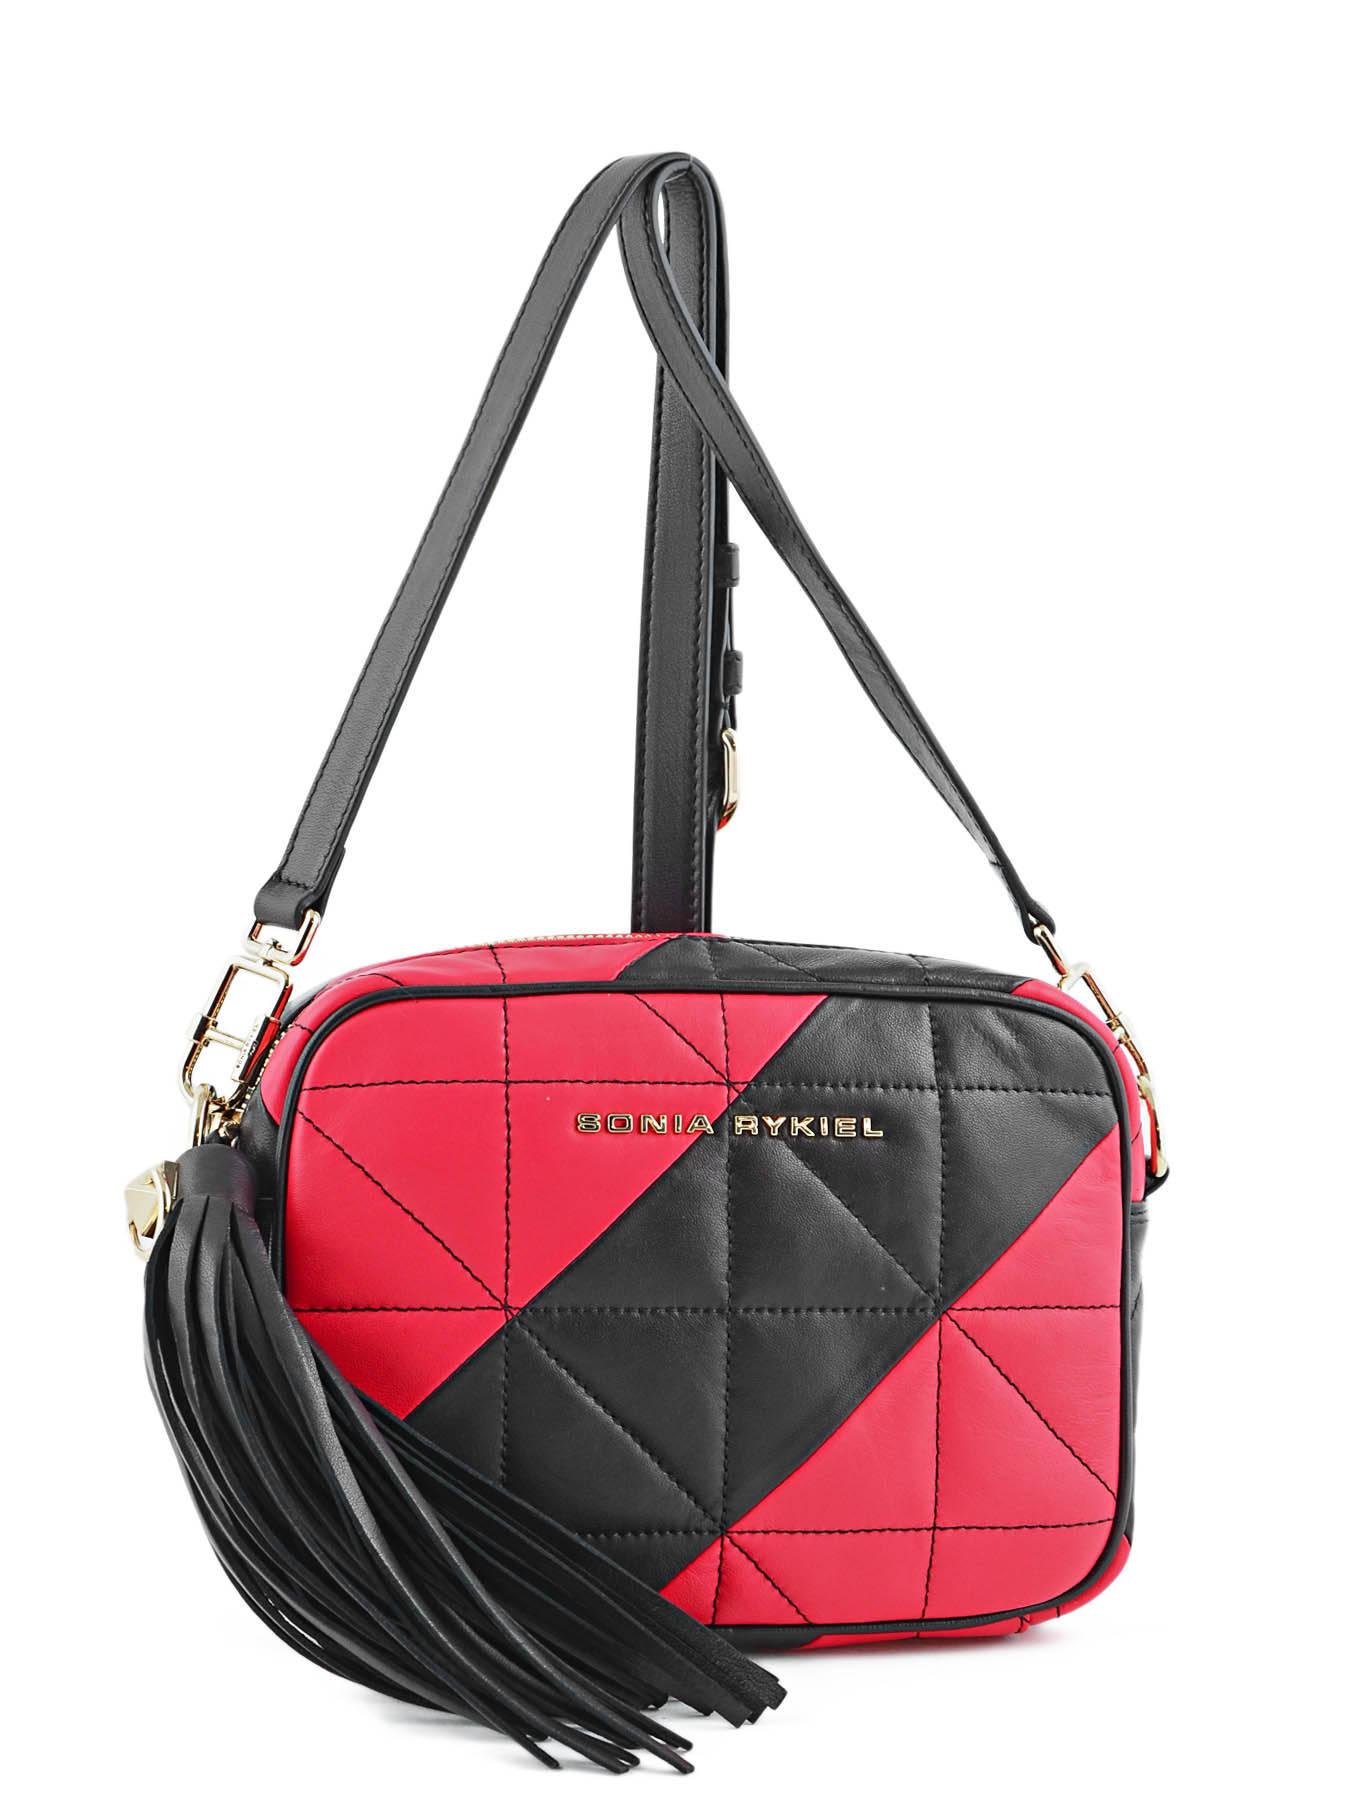 Shoulder Bag Copain Leather Sonia rykiel Pink copain 8164-43